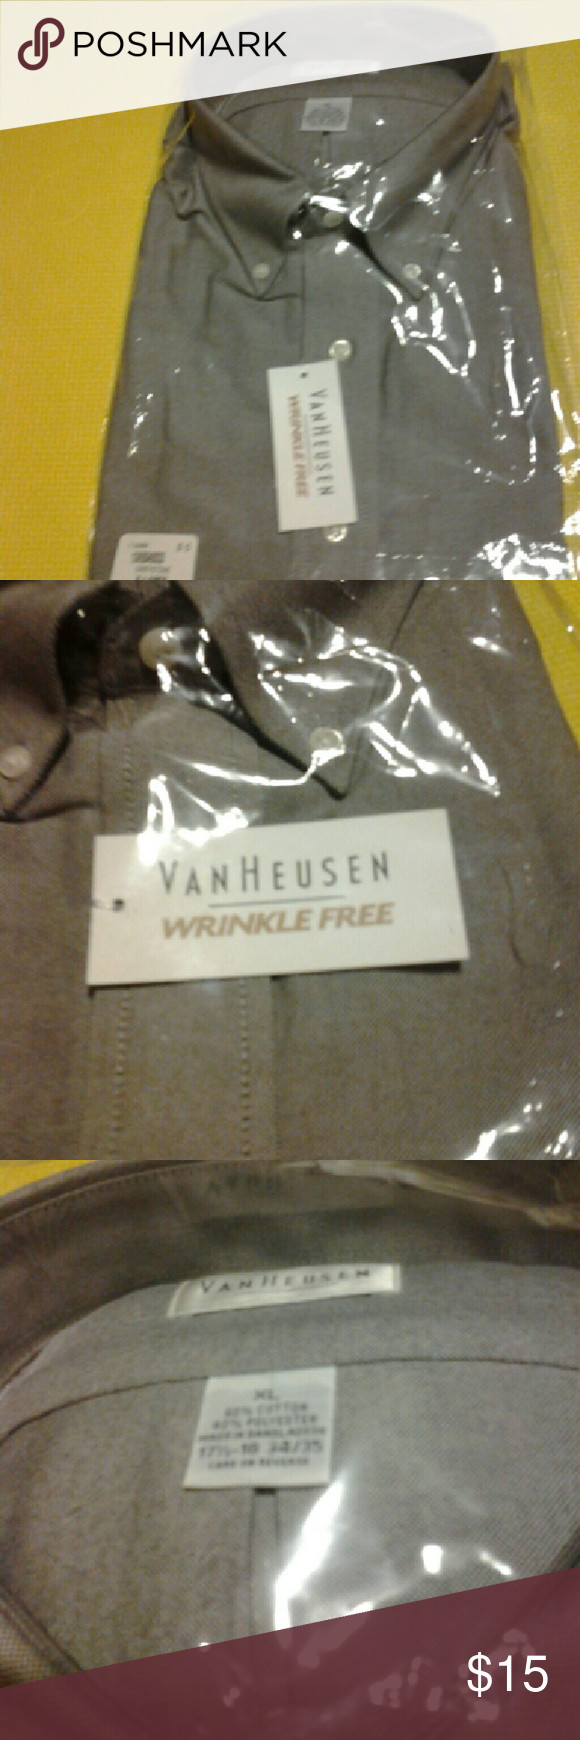 Shirt Van Huesen greystone long sleeve button down dress shirt, new still in package, no price tag Van Heusen Shirts Dress Shirts